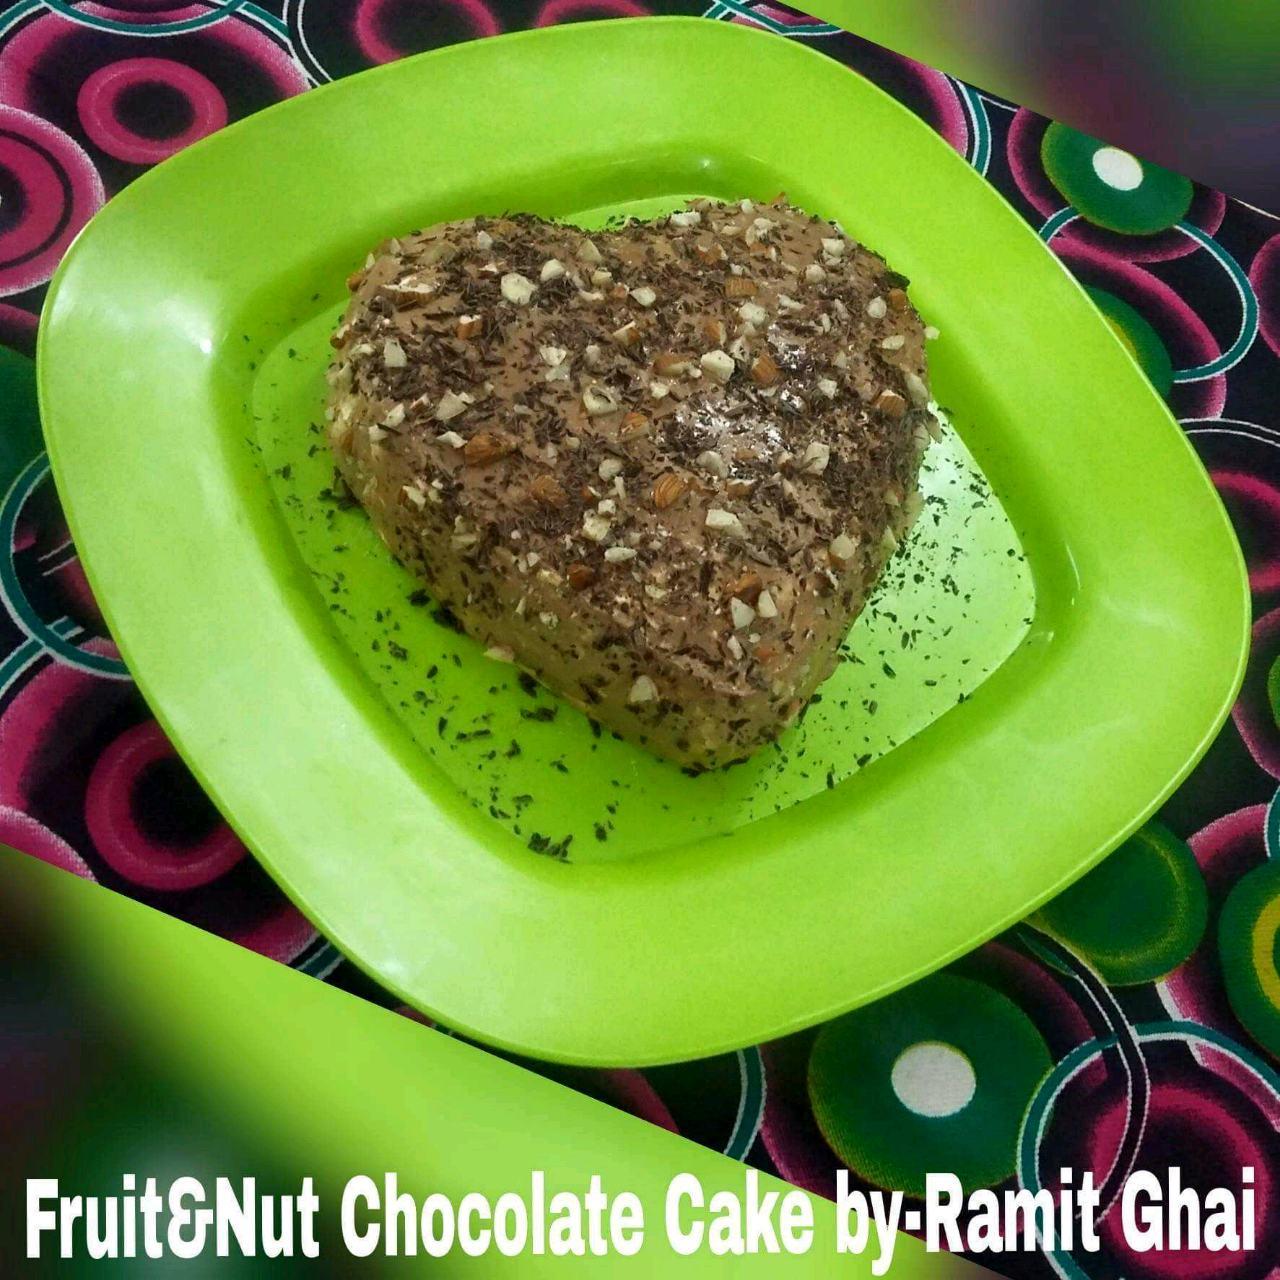 Fruit&Nut Chocolate Cake